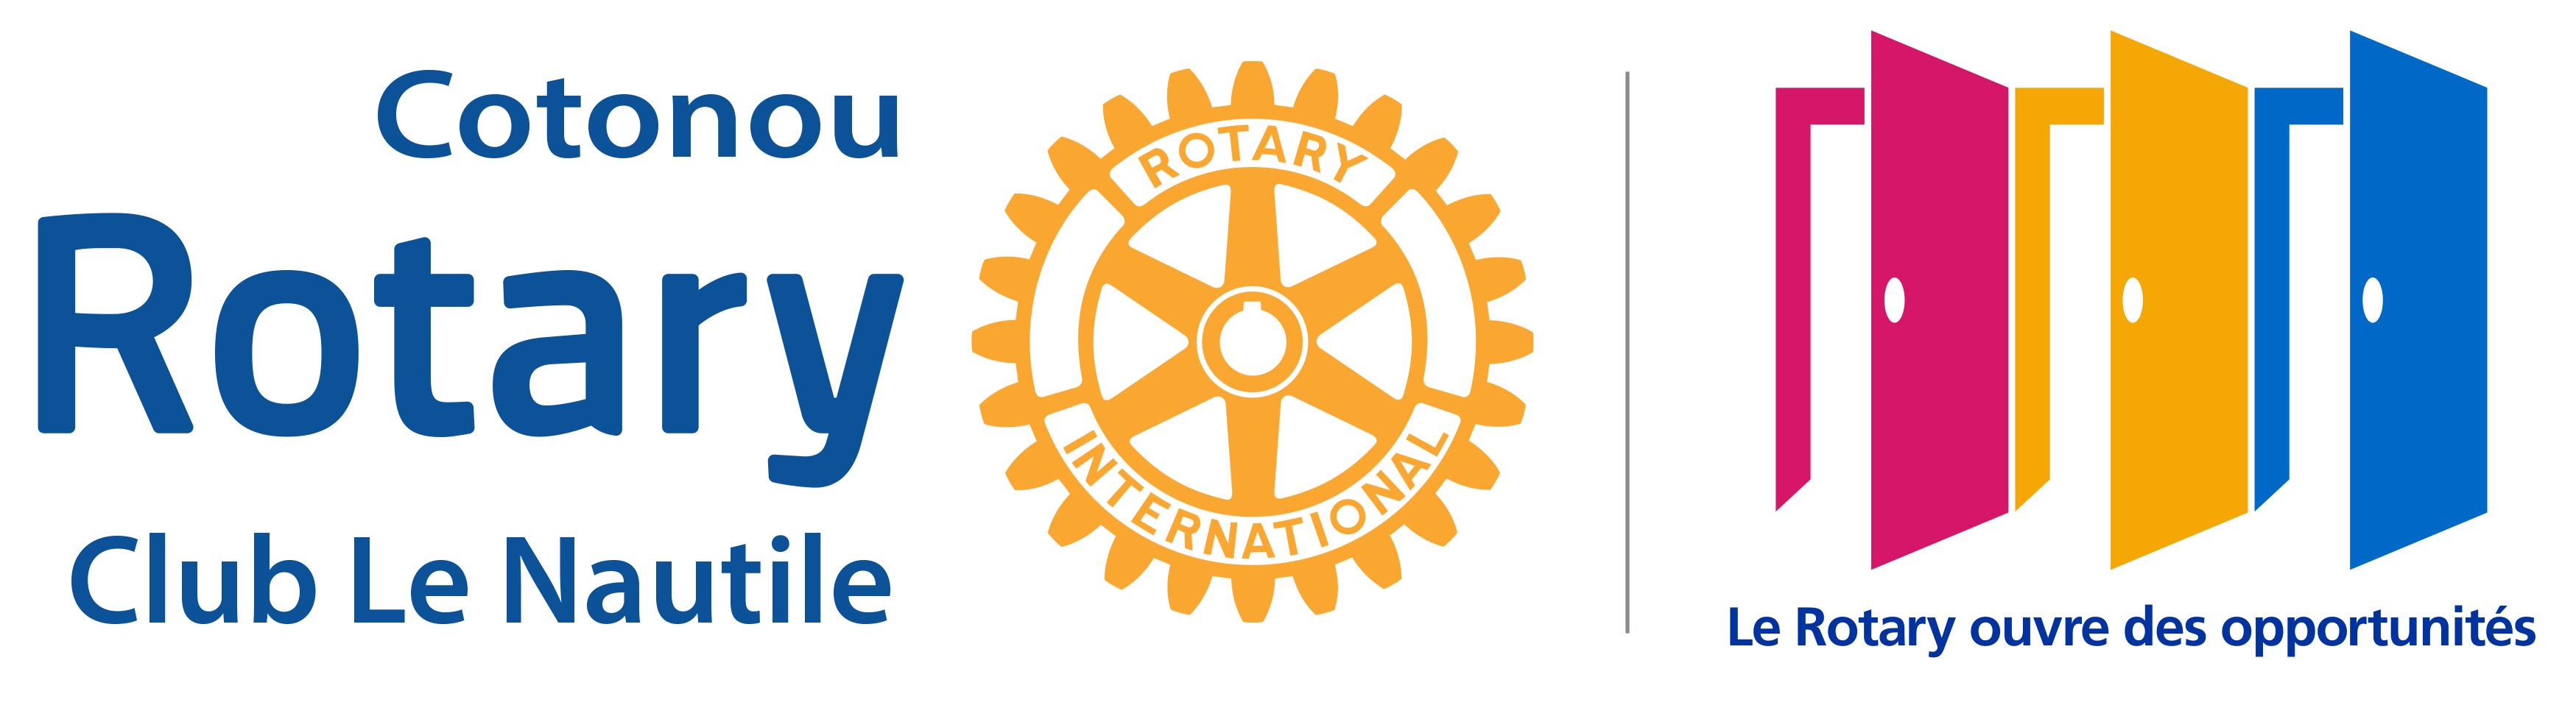 Rotary Club de Cotonou Le Nautile